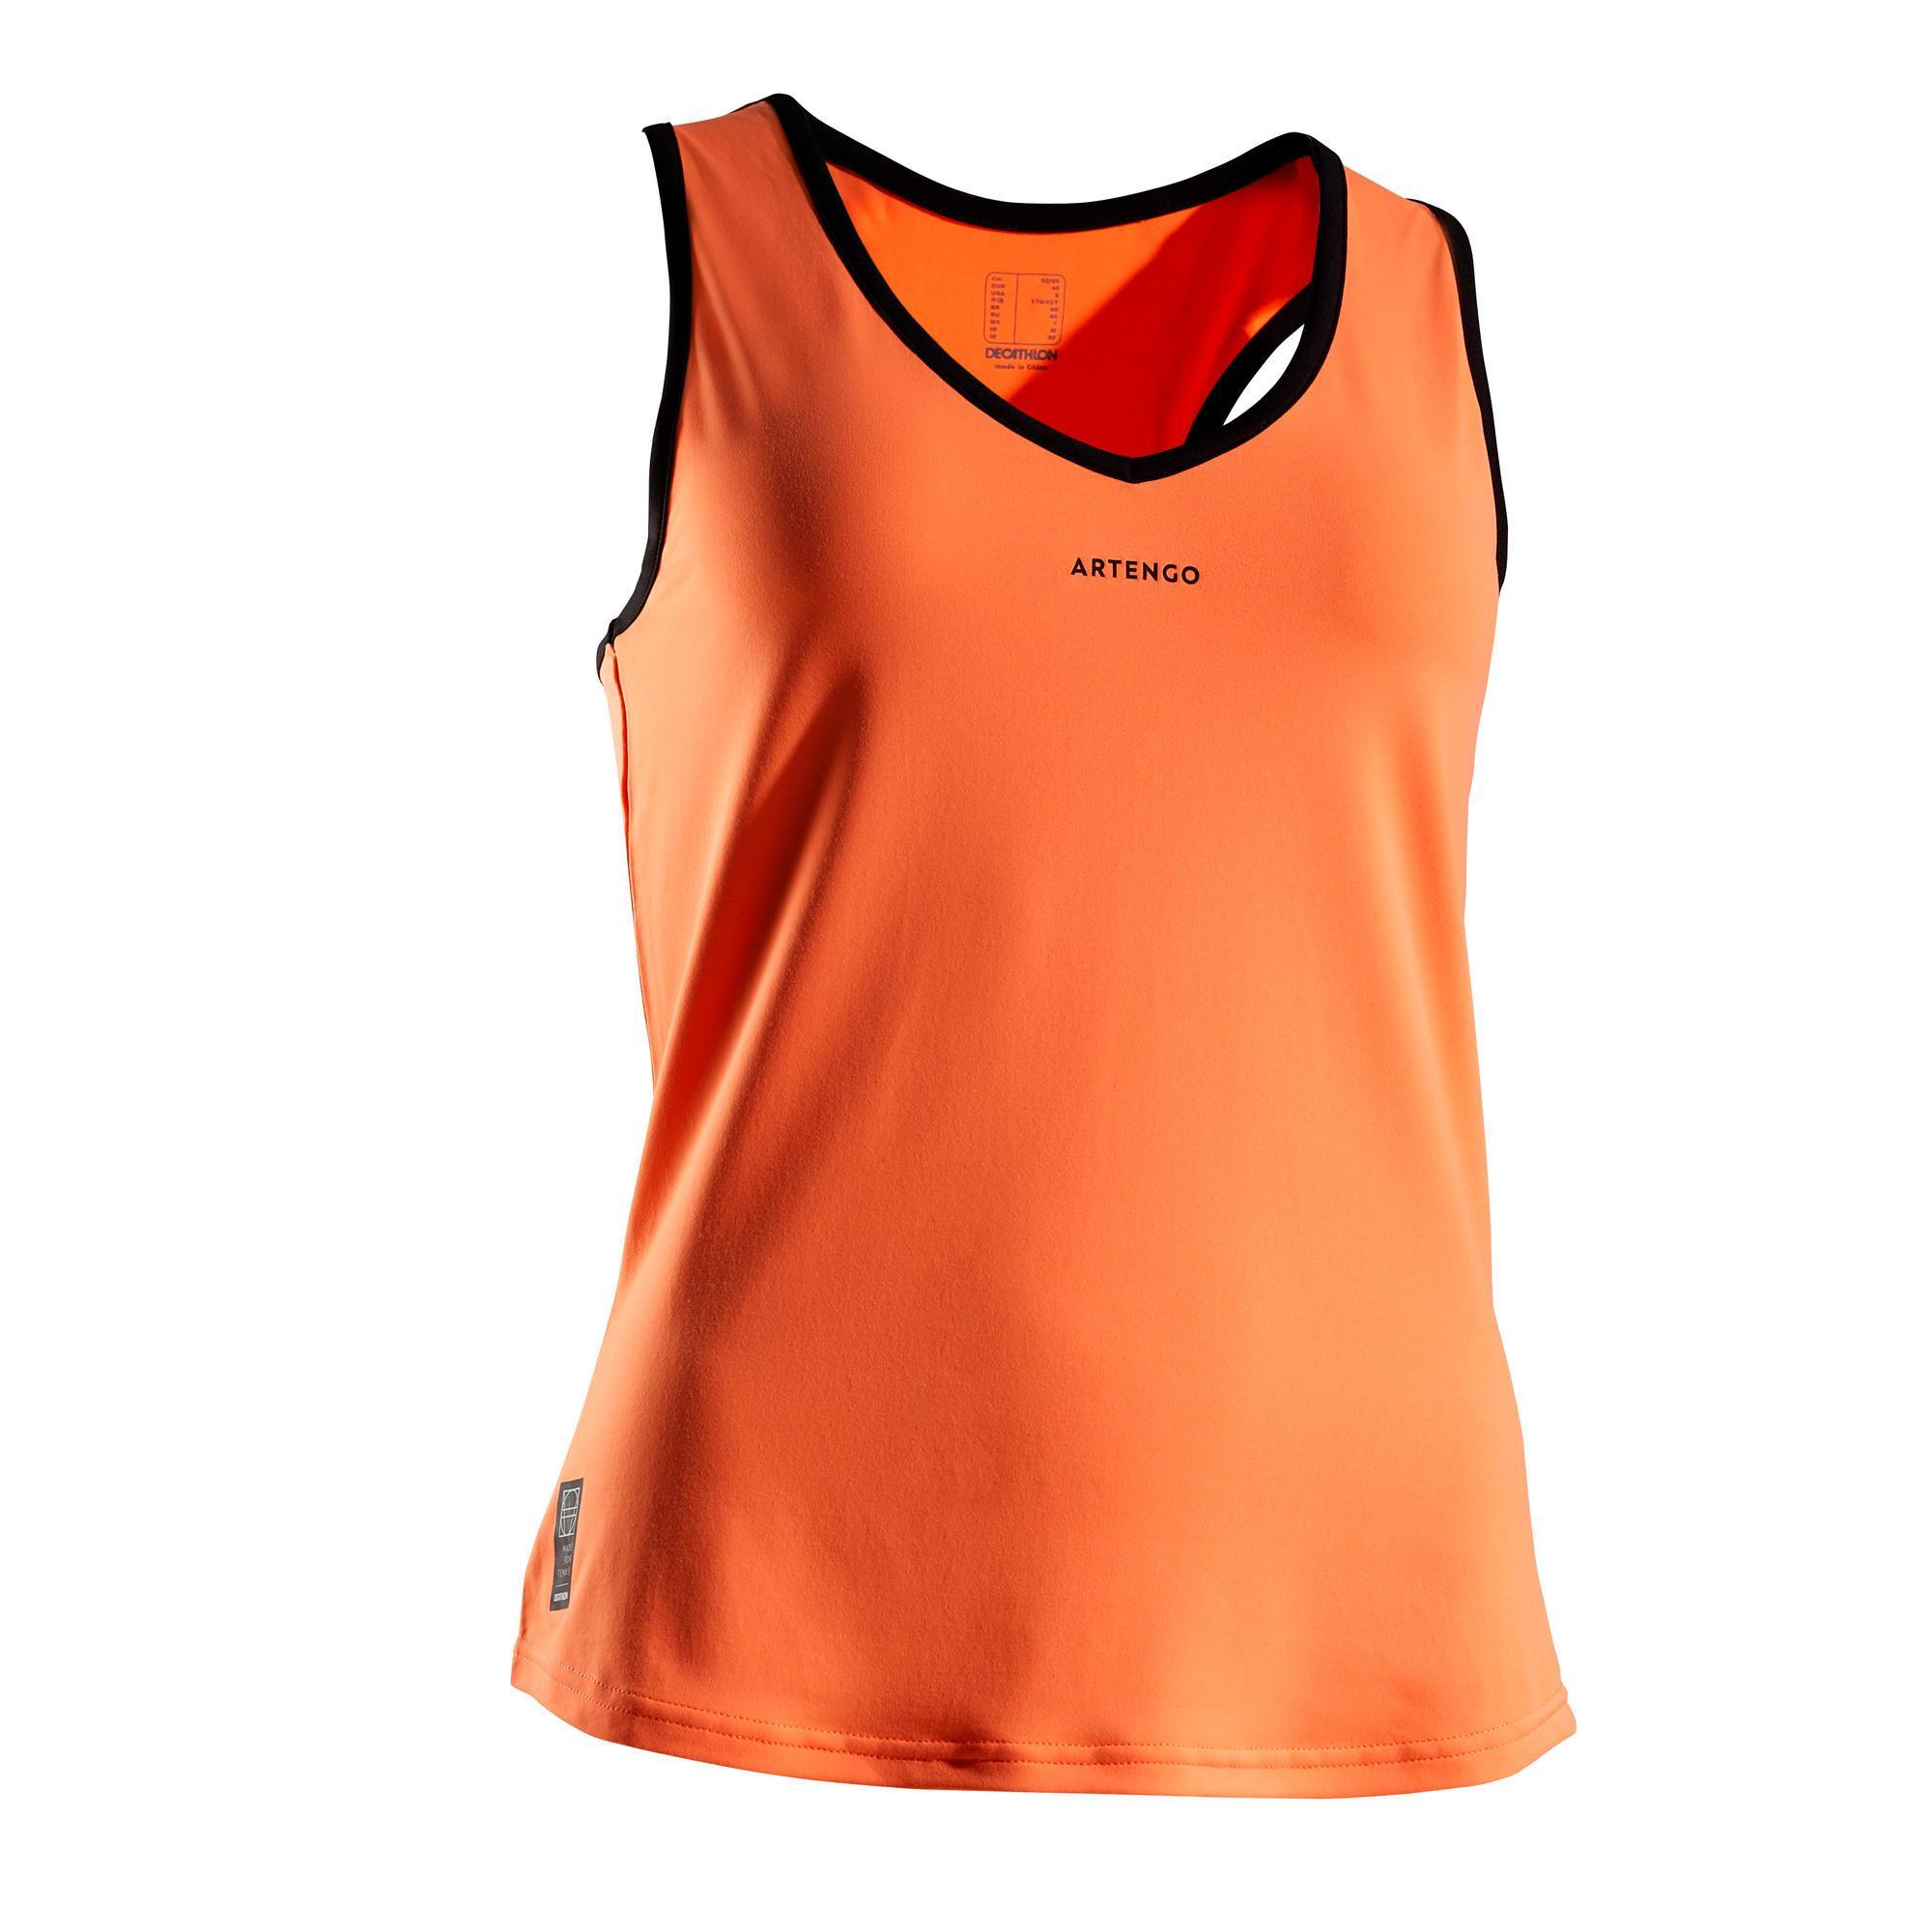 Tennis-Top TK Light 900 Damen orange | Sportbekleidung > Sporttops > Tennistops | Artengo